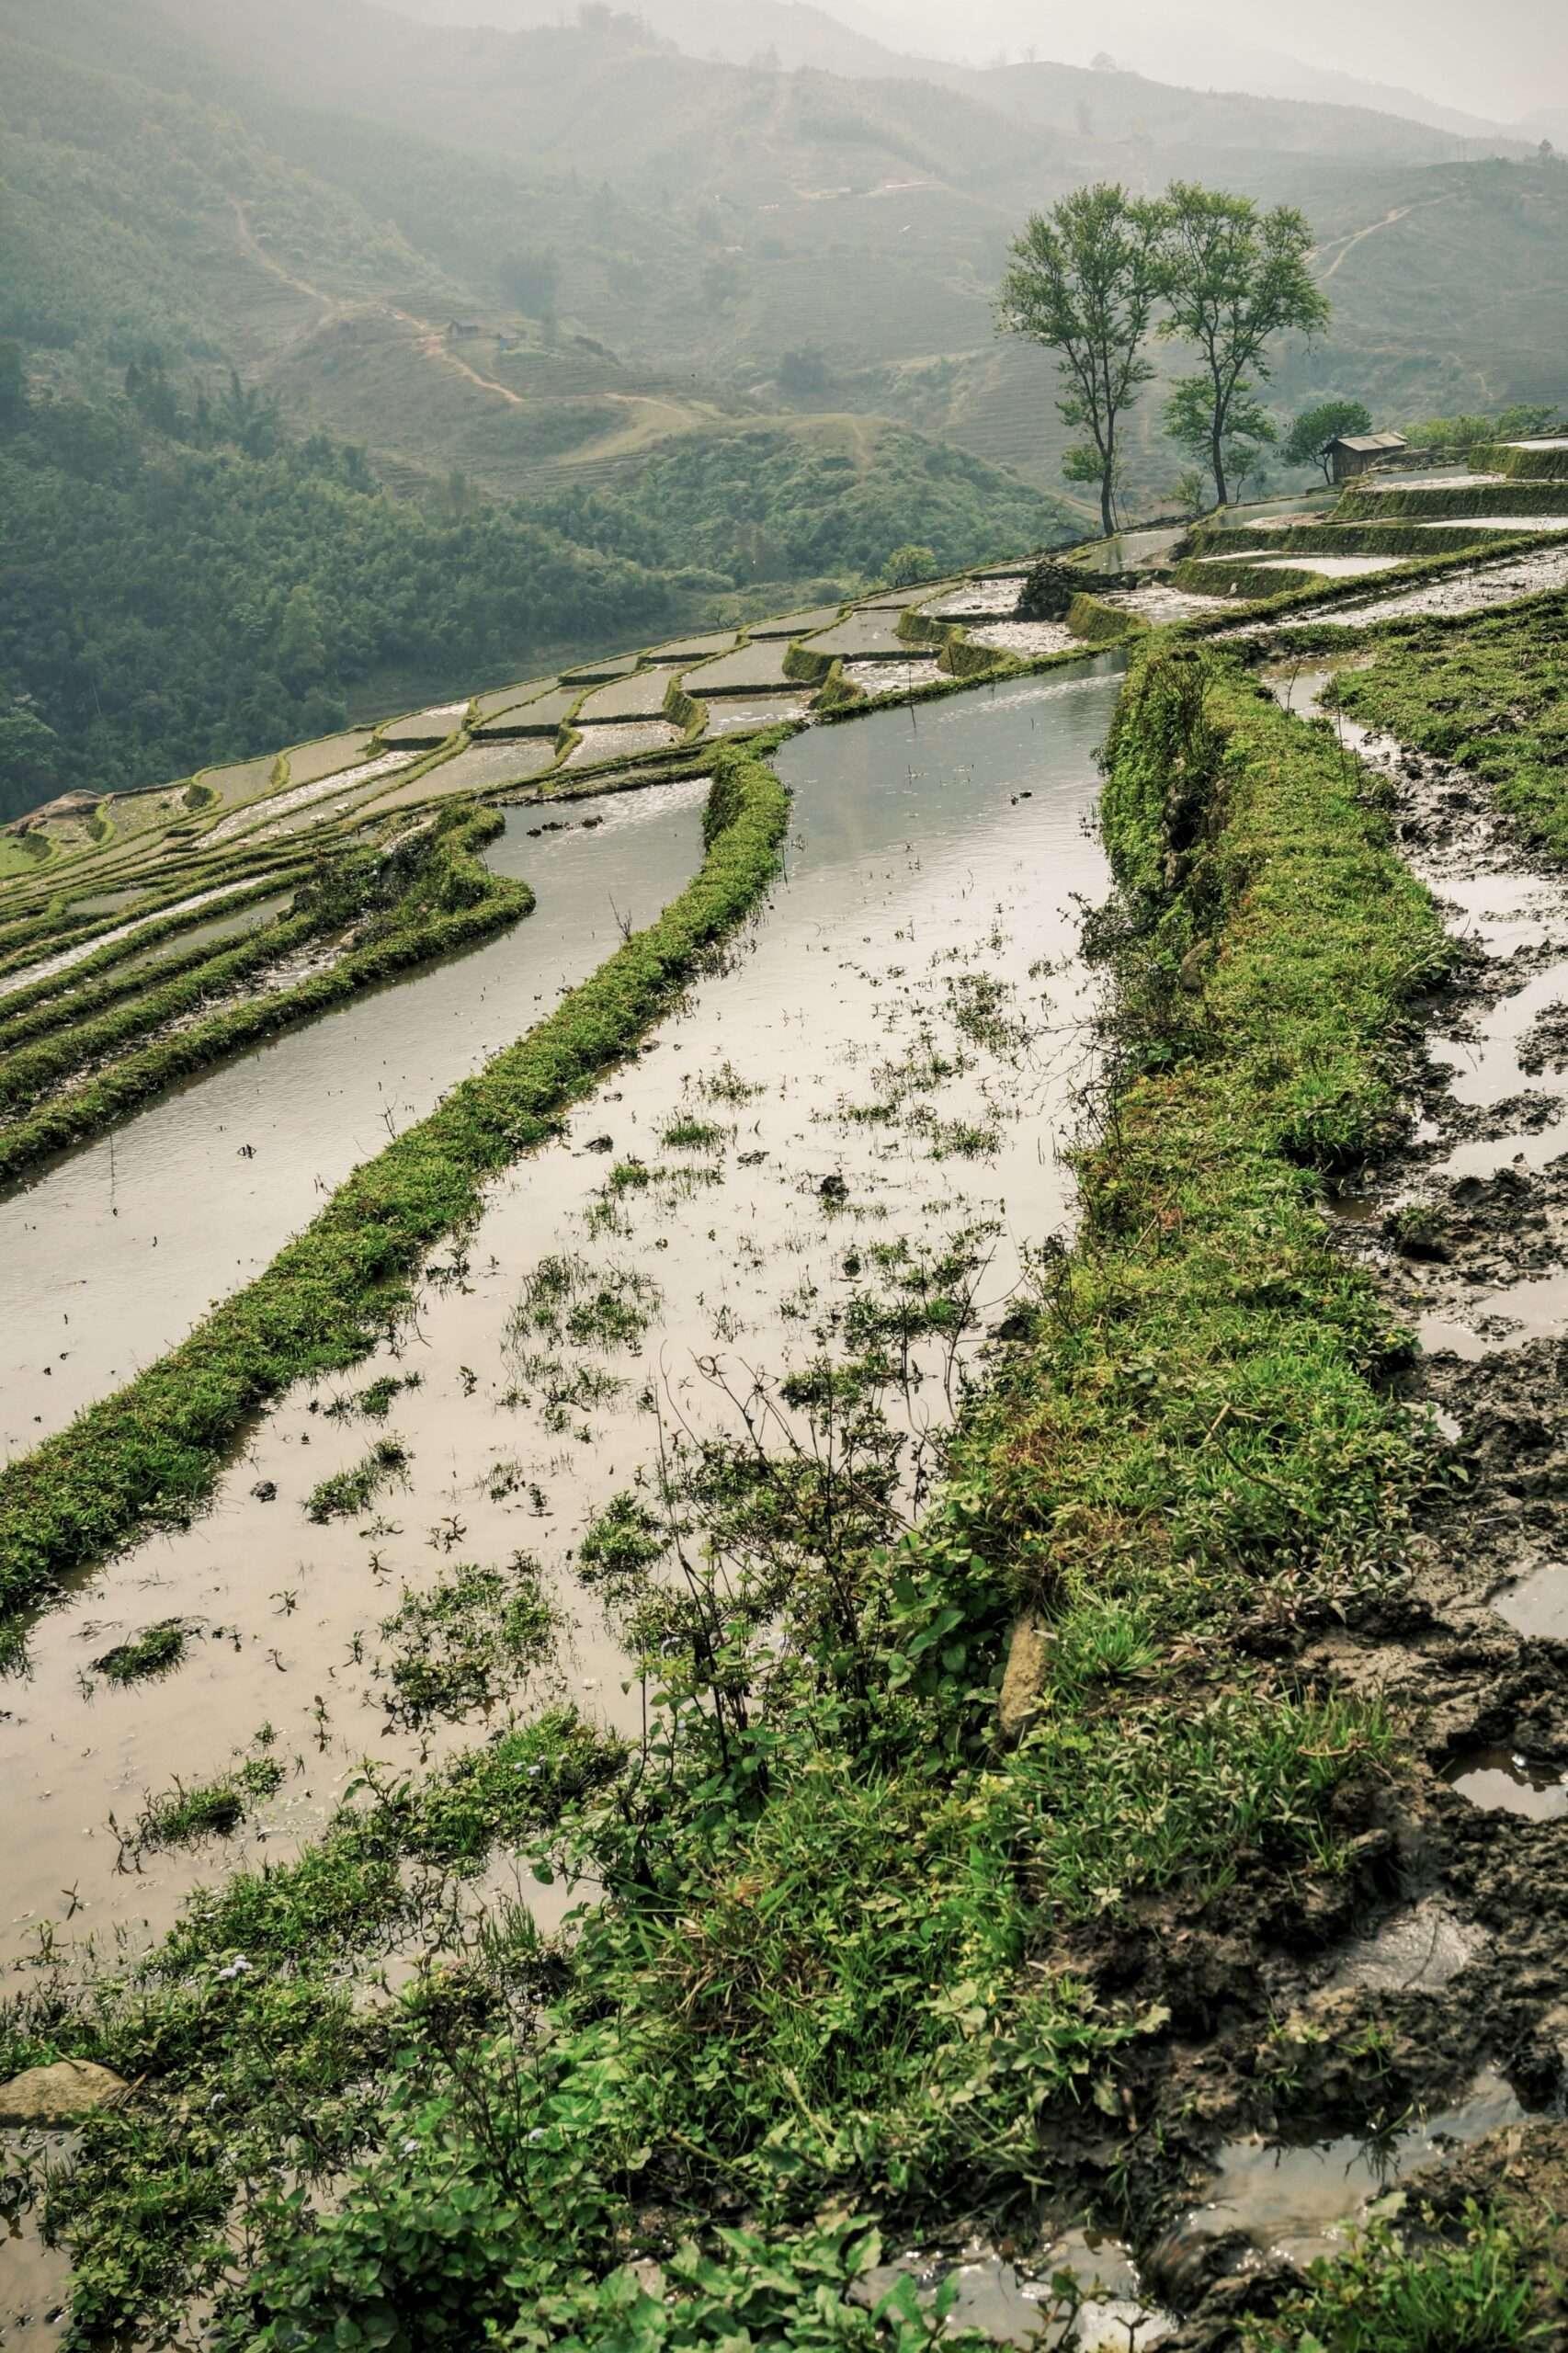 rice paddies submerged in water, seen whilst trekking in Sapa